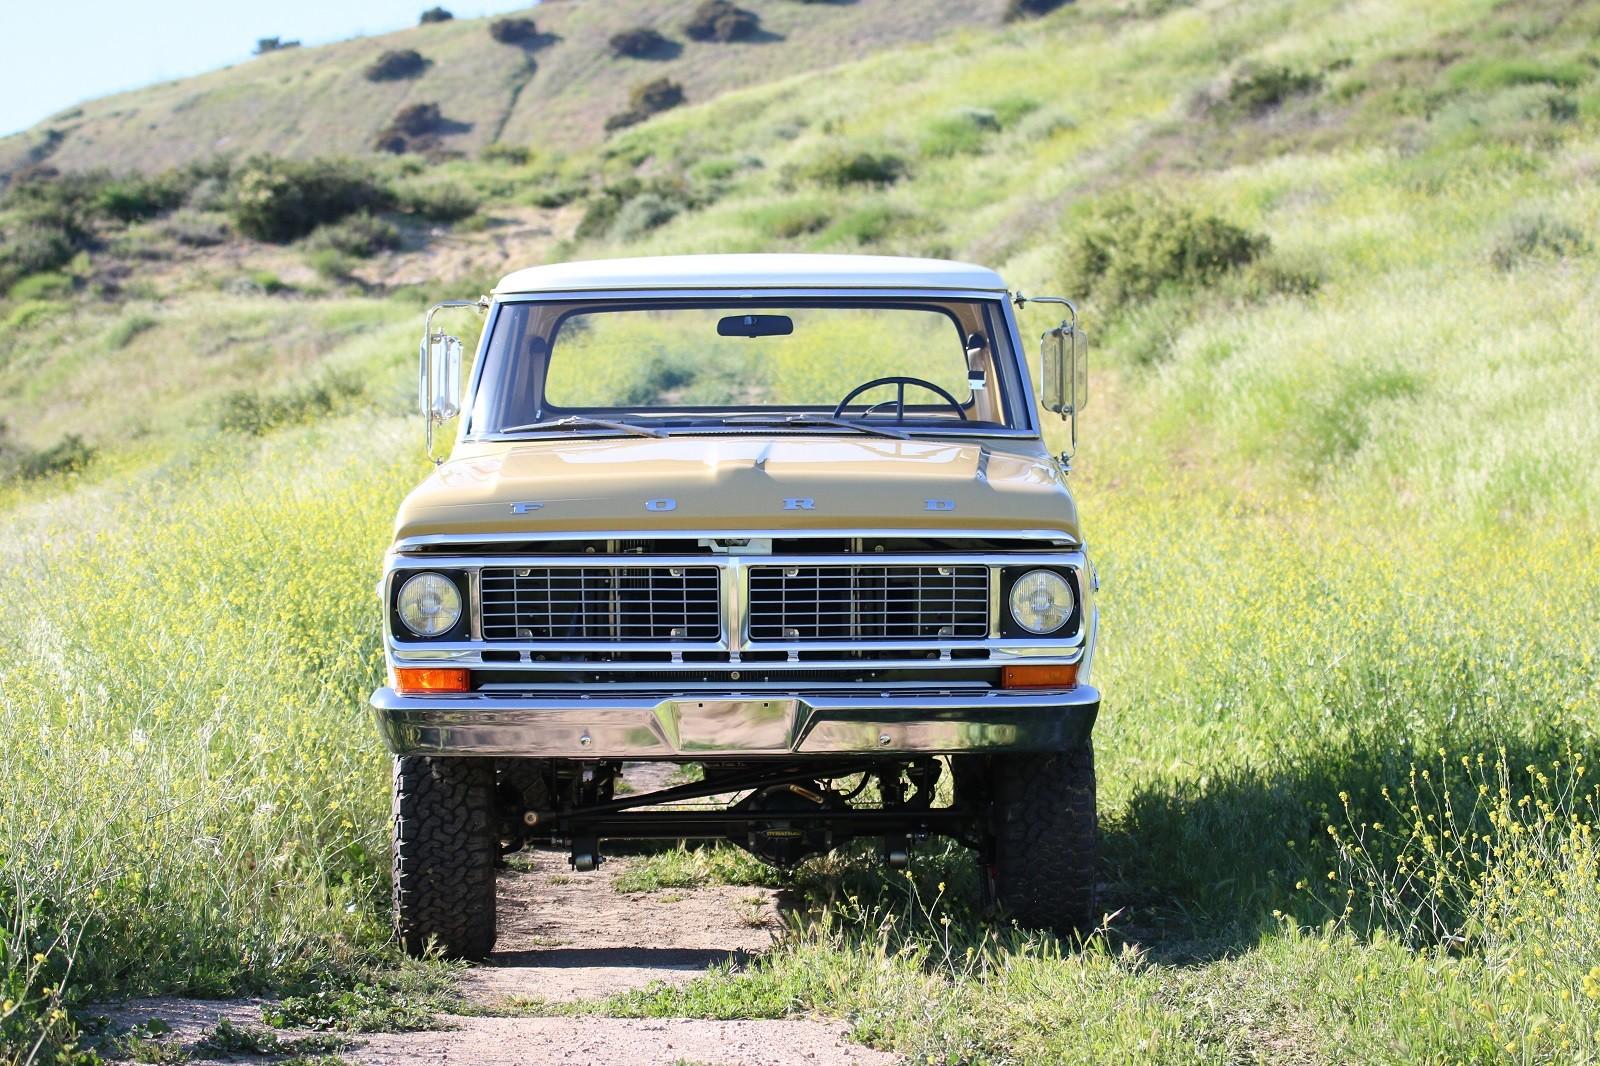 Foto de ICON 4x4 Ranger 1970 Reformer Series (36/38)